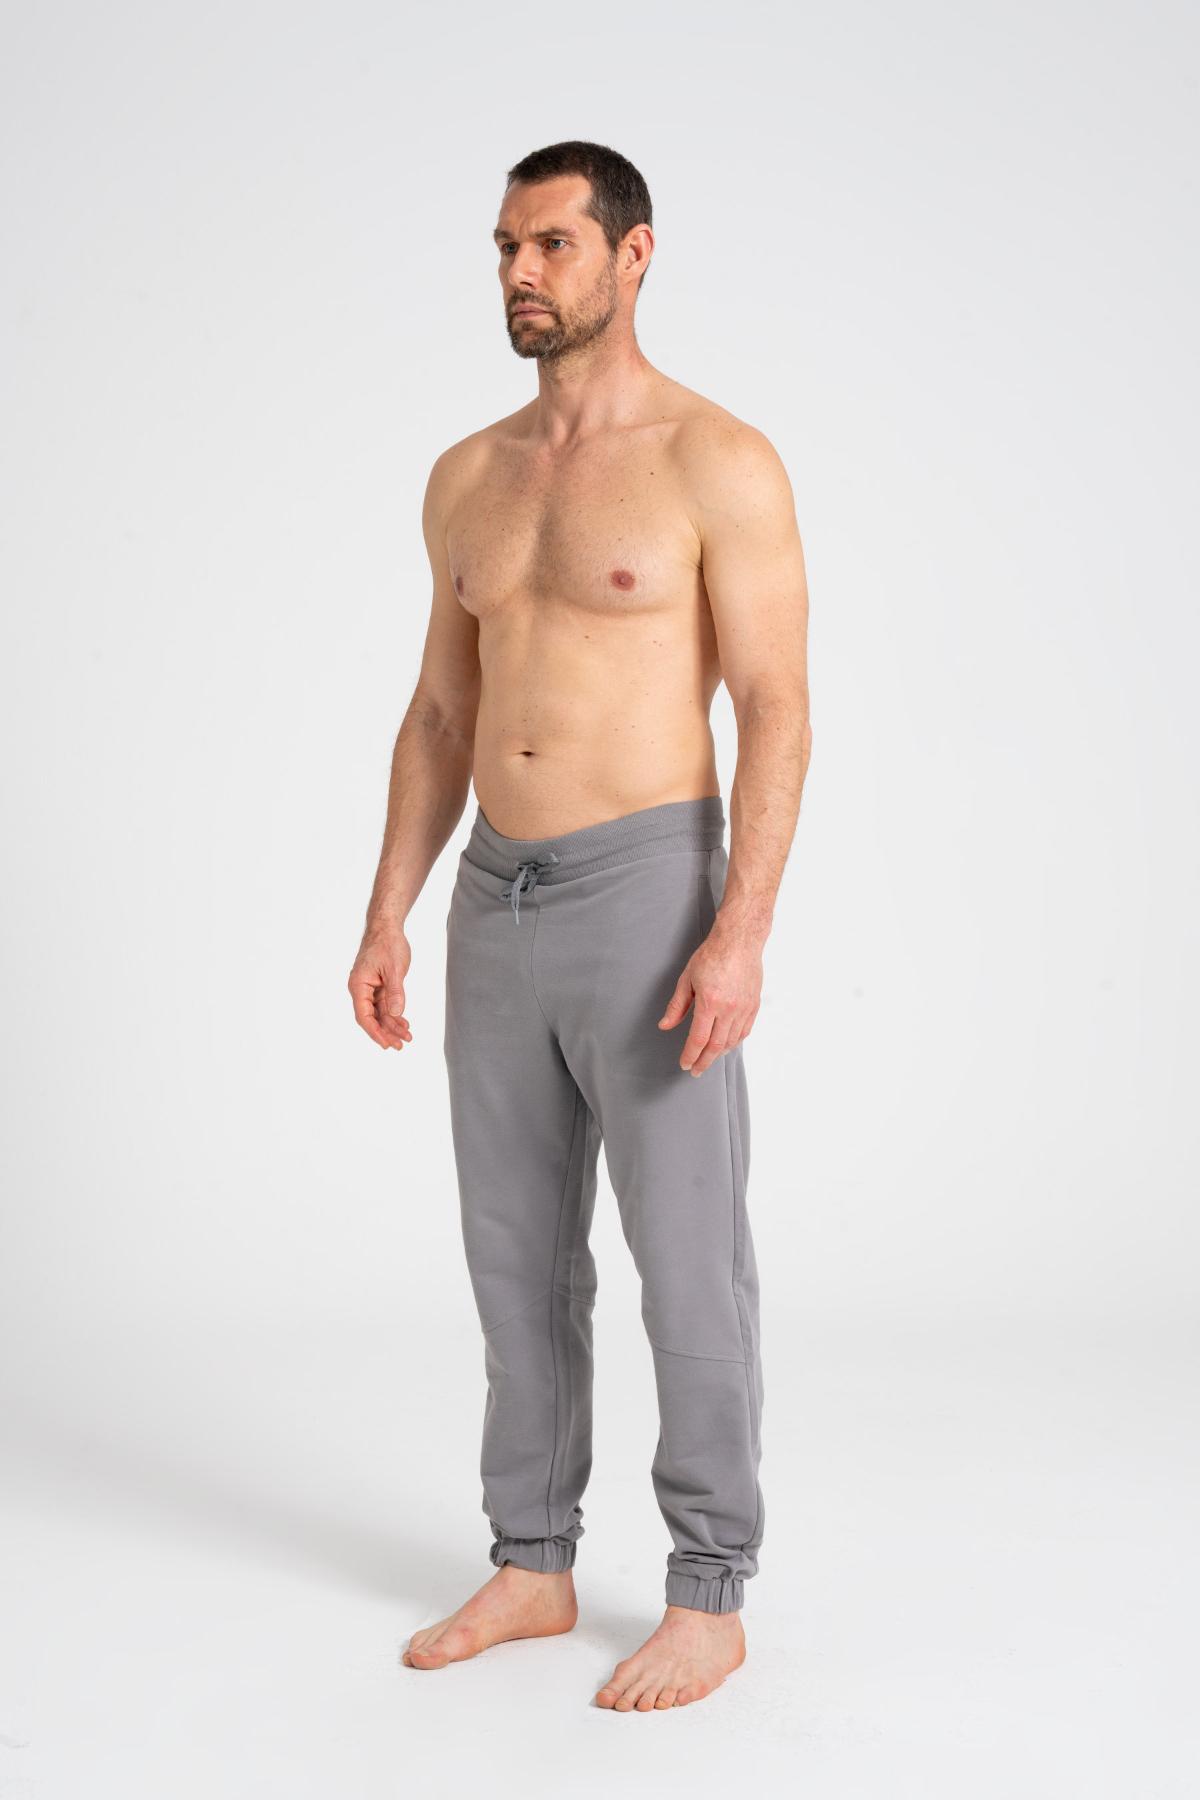 Ribana Waist Men's Sweatpants newces-5012-G